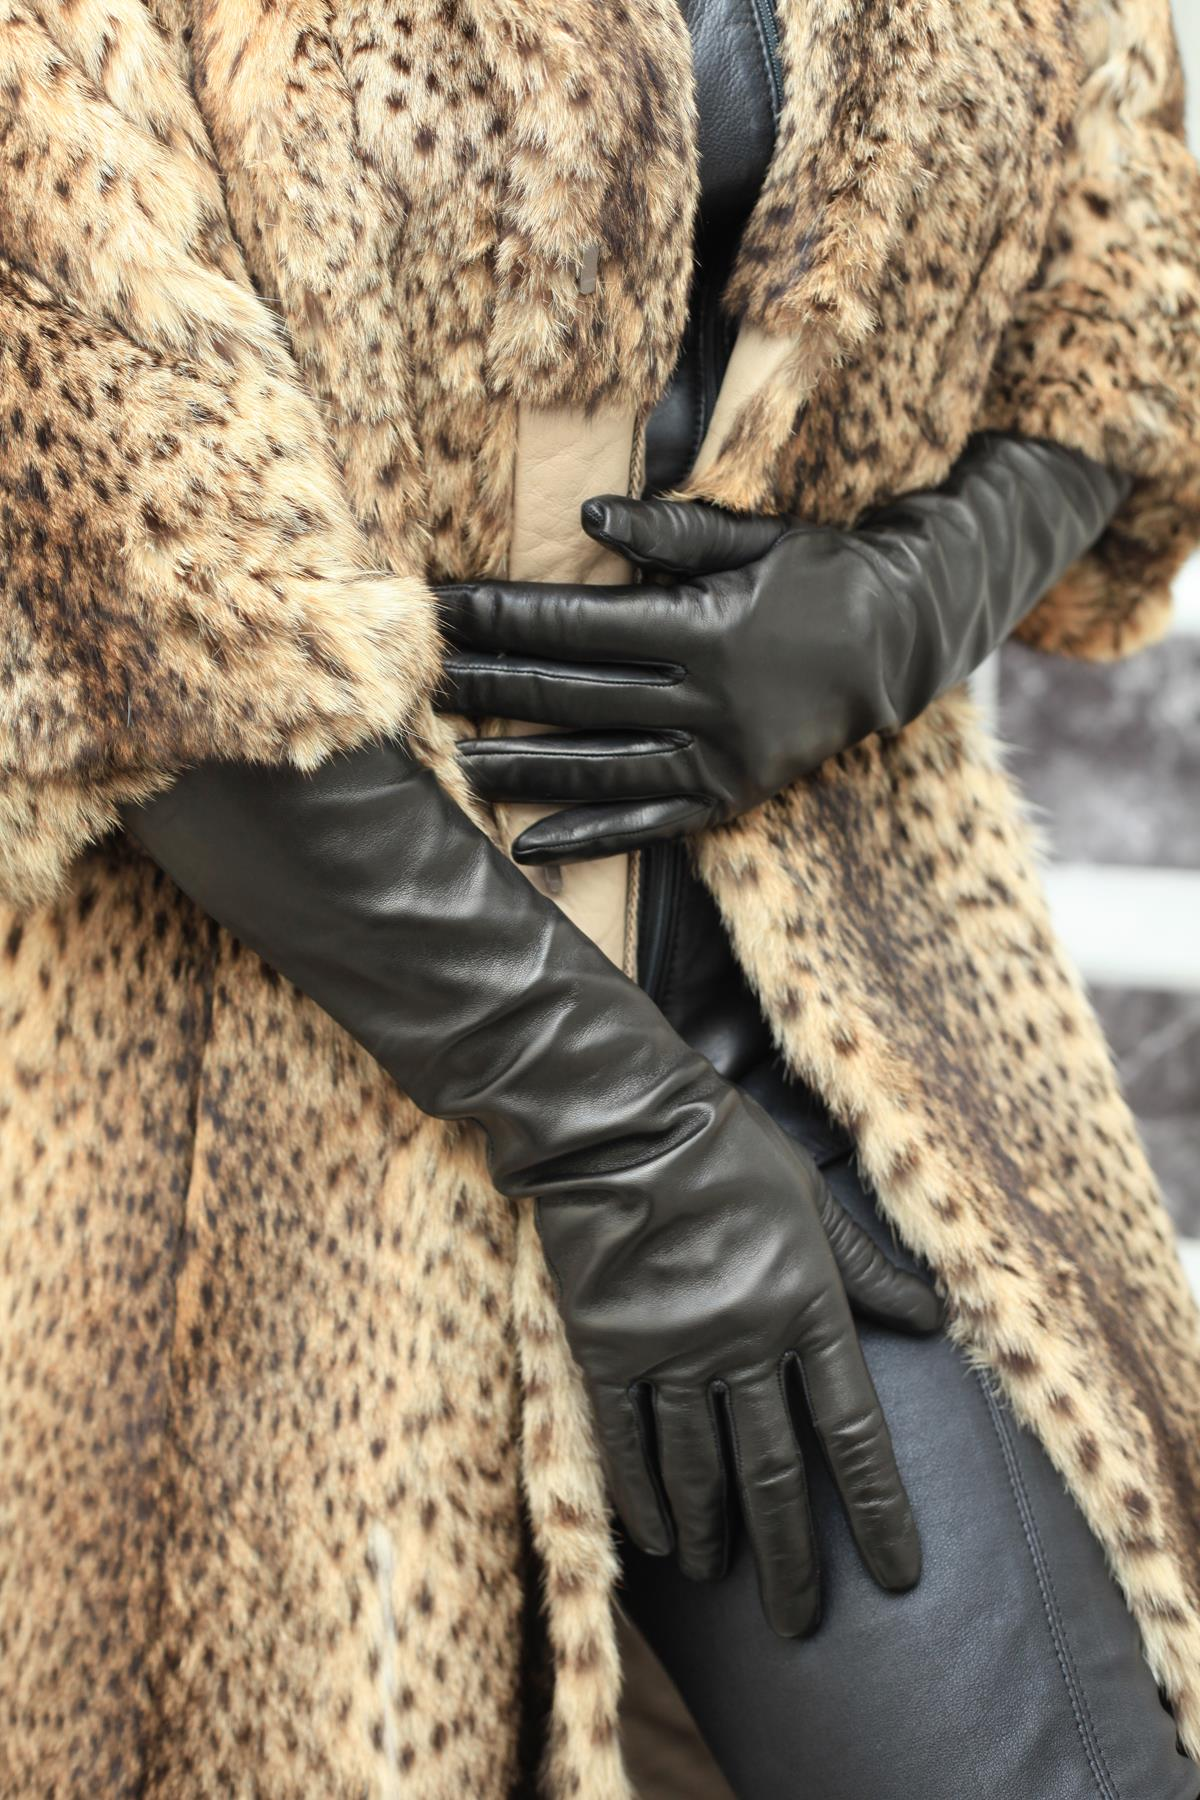 40 cm ellenbogenlange Damen Lederhandschuhe ungefüttert